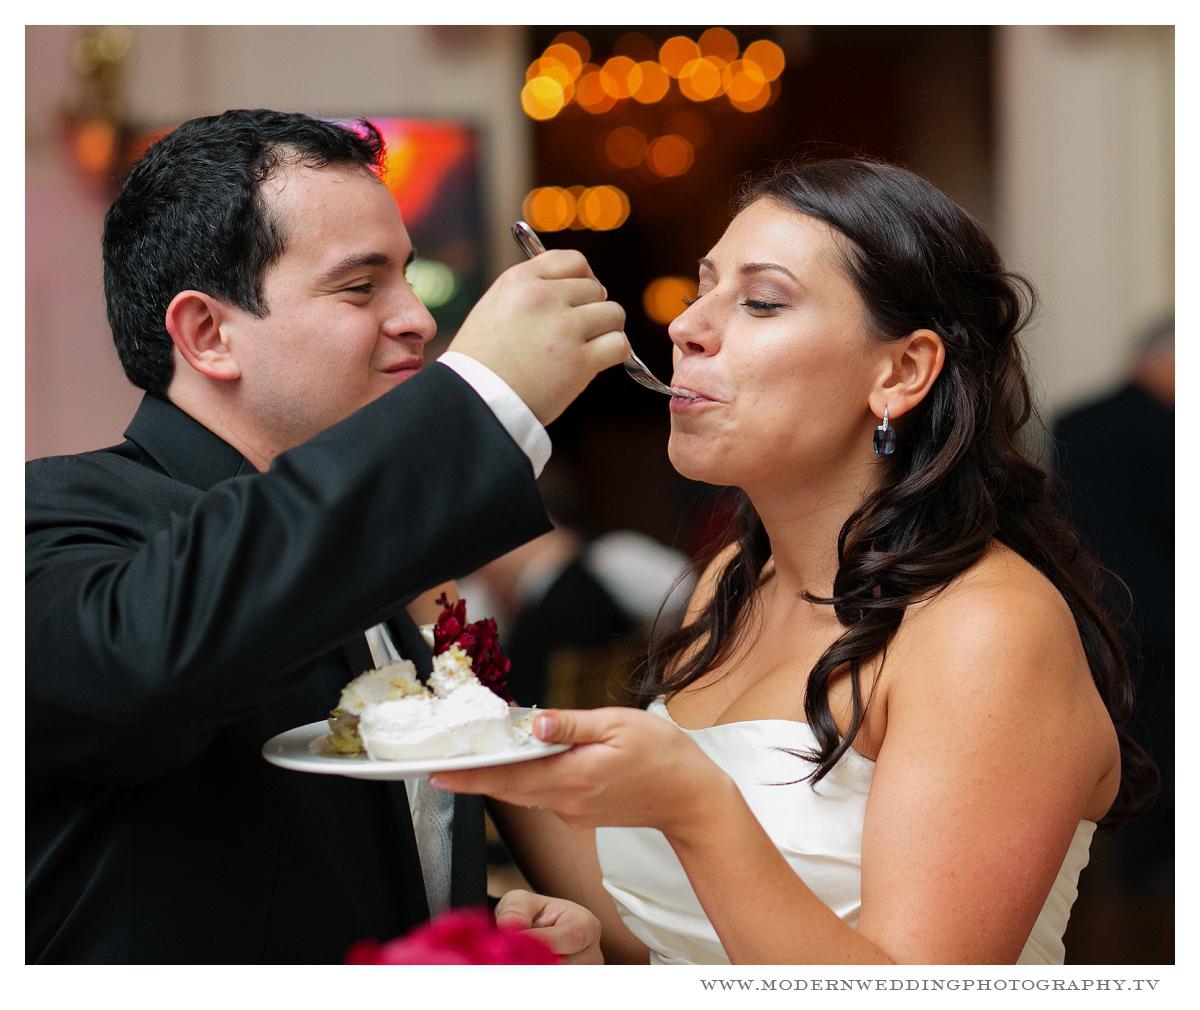 Modern Wedding Photography 1043 .jpg